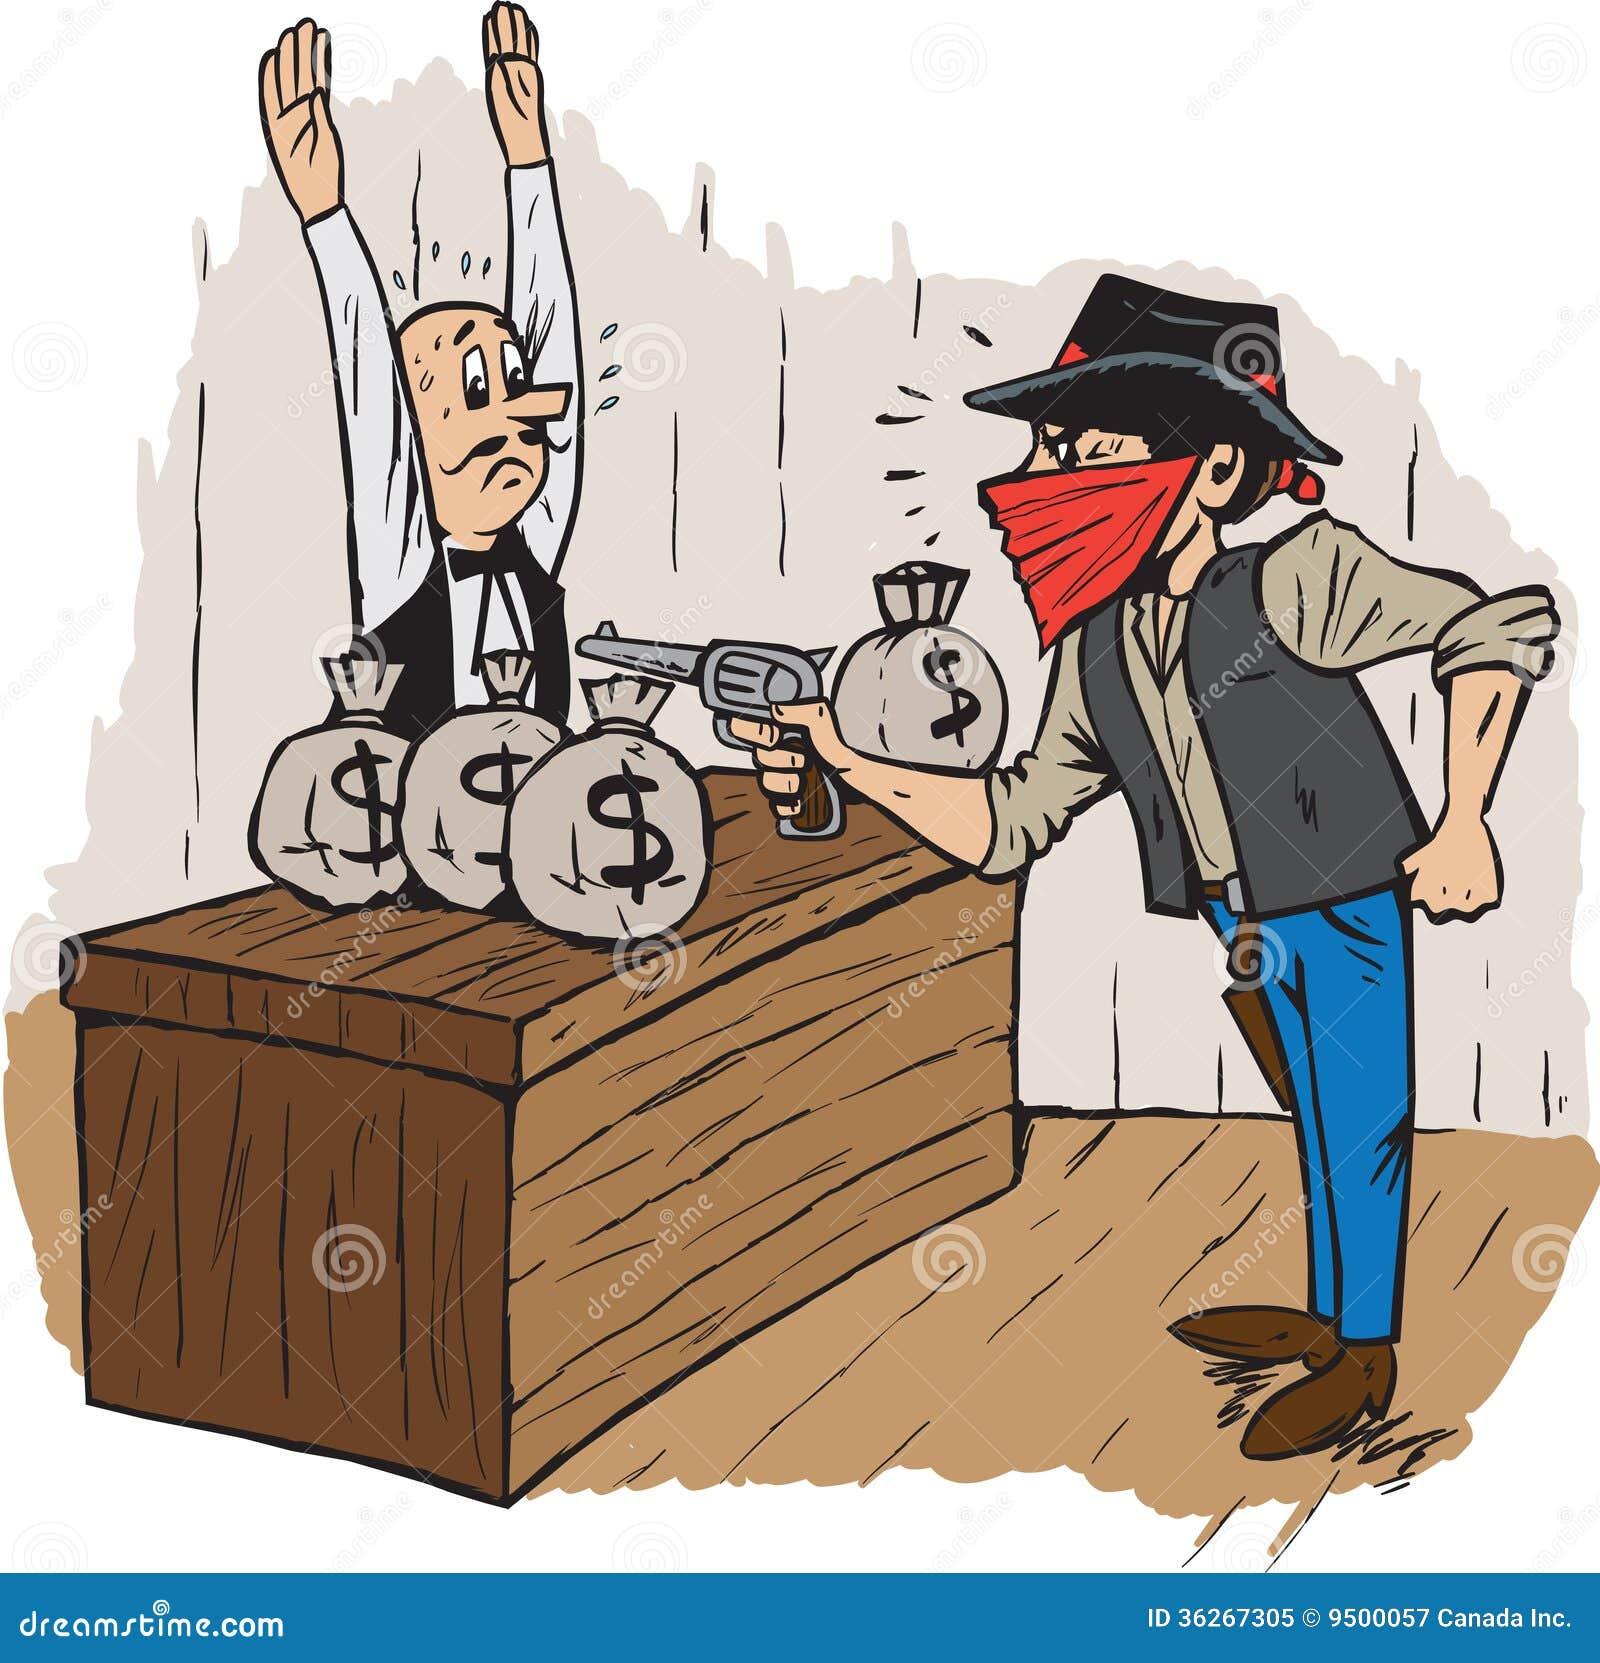 Robbery Stock Illustrations